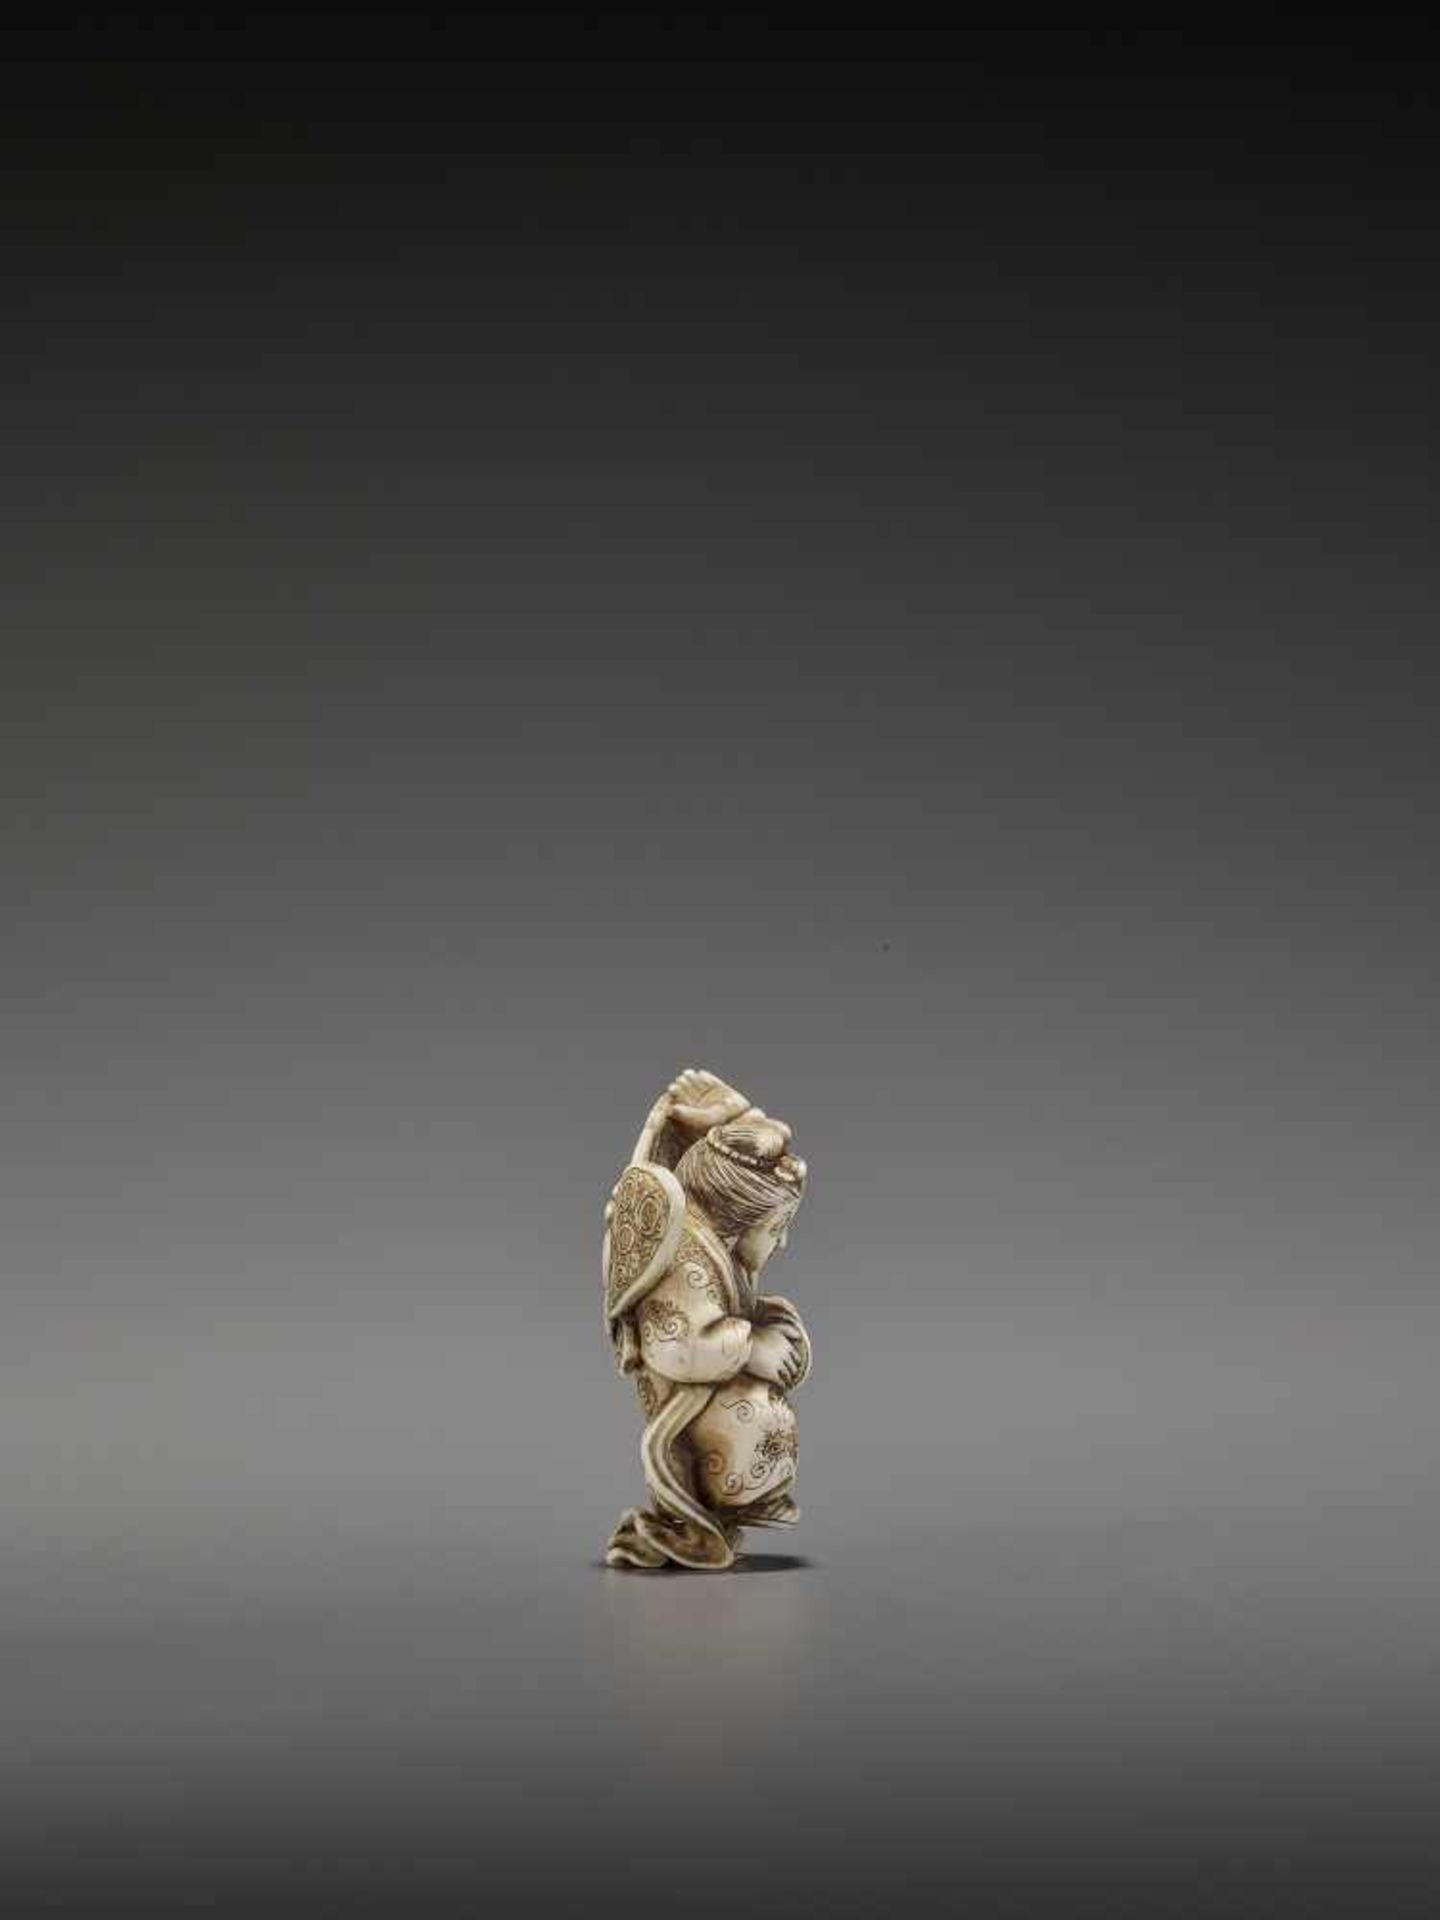 MASAHIRO: A VERY RARE IVORY NETSUKE OF A BUTTERFLY DANCER, KOCHO NO MAI By Masahiro, signed - Image 8 of 13